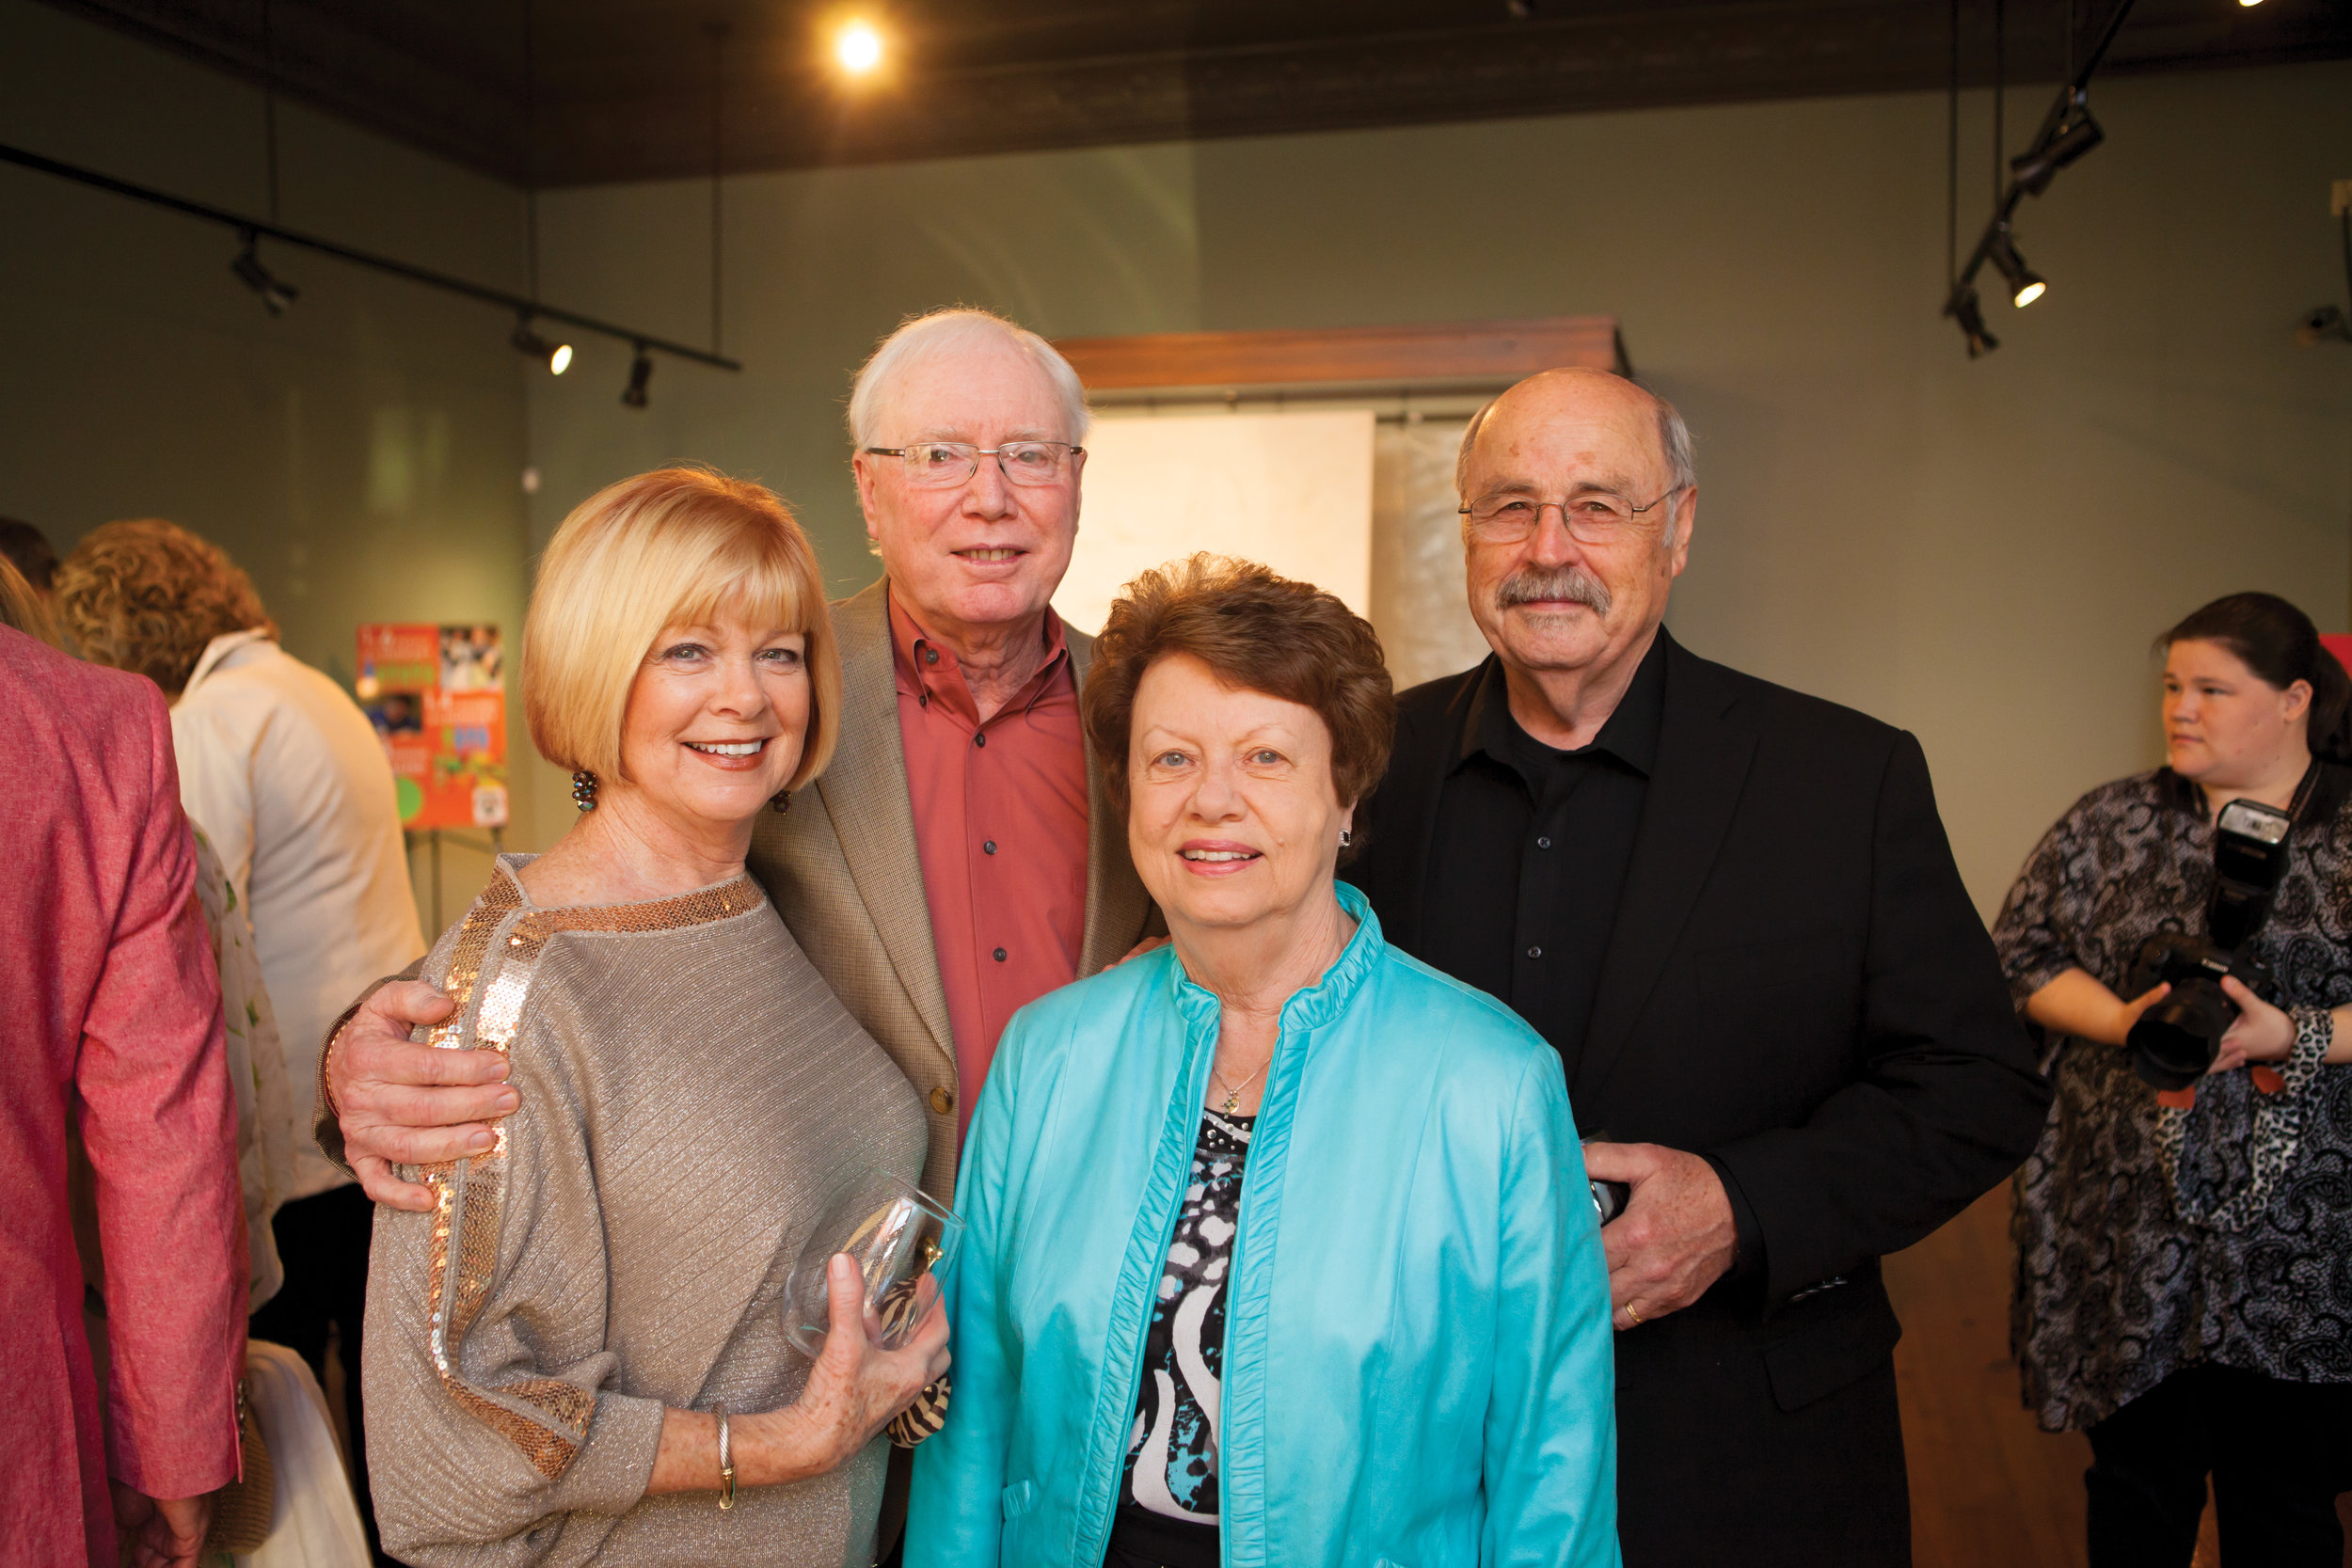 Jane Richards and Ronald Stewart with Bridget and Philip White